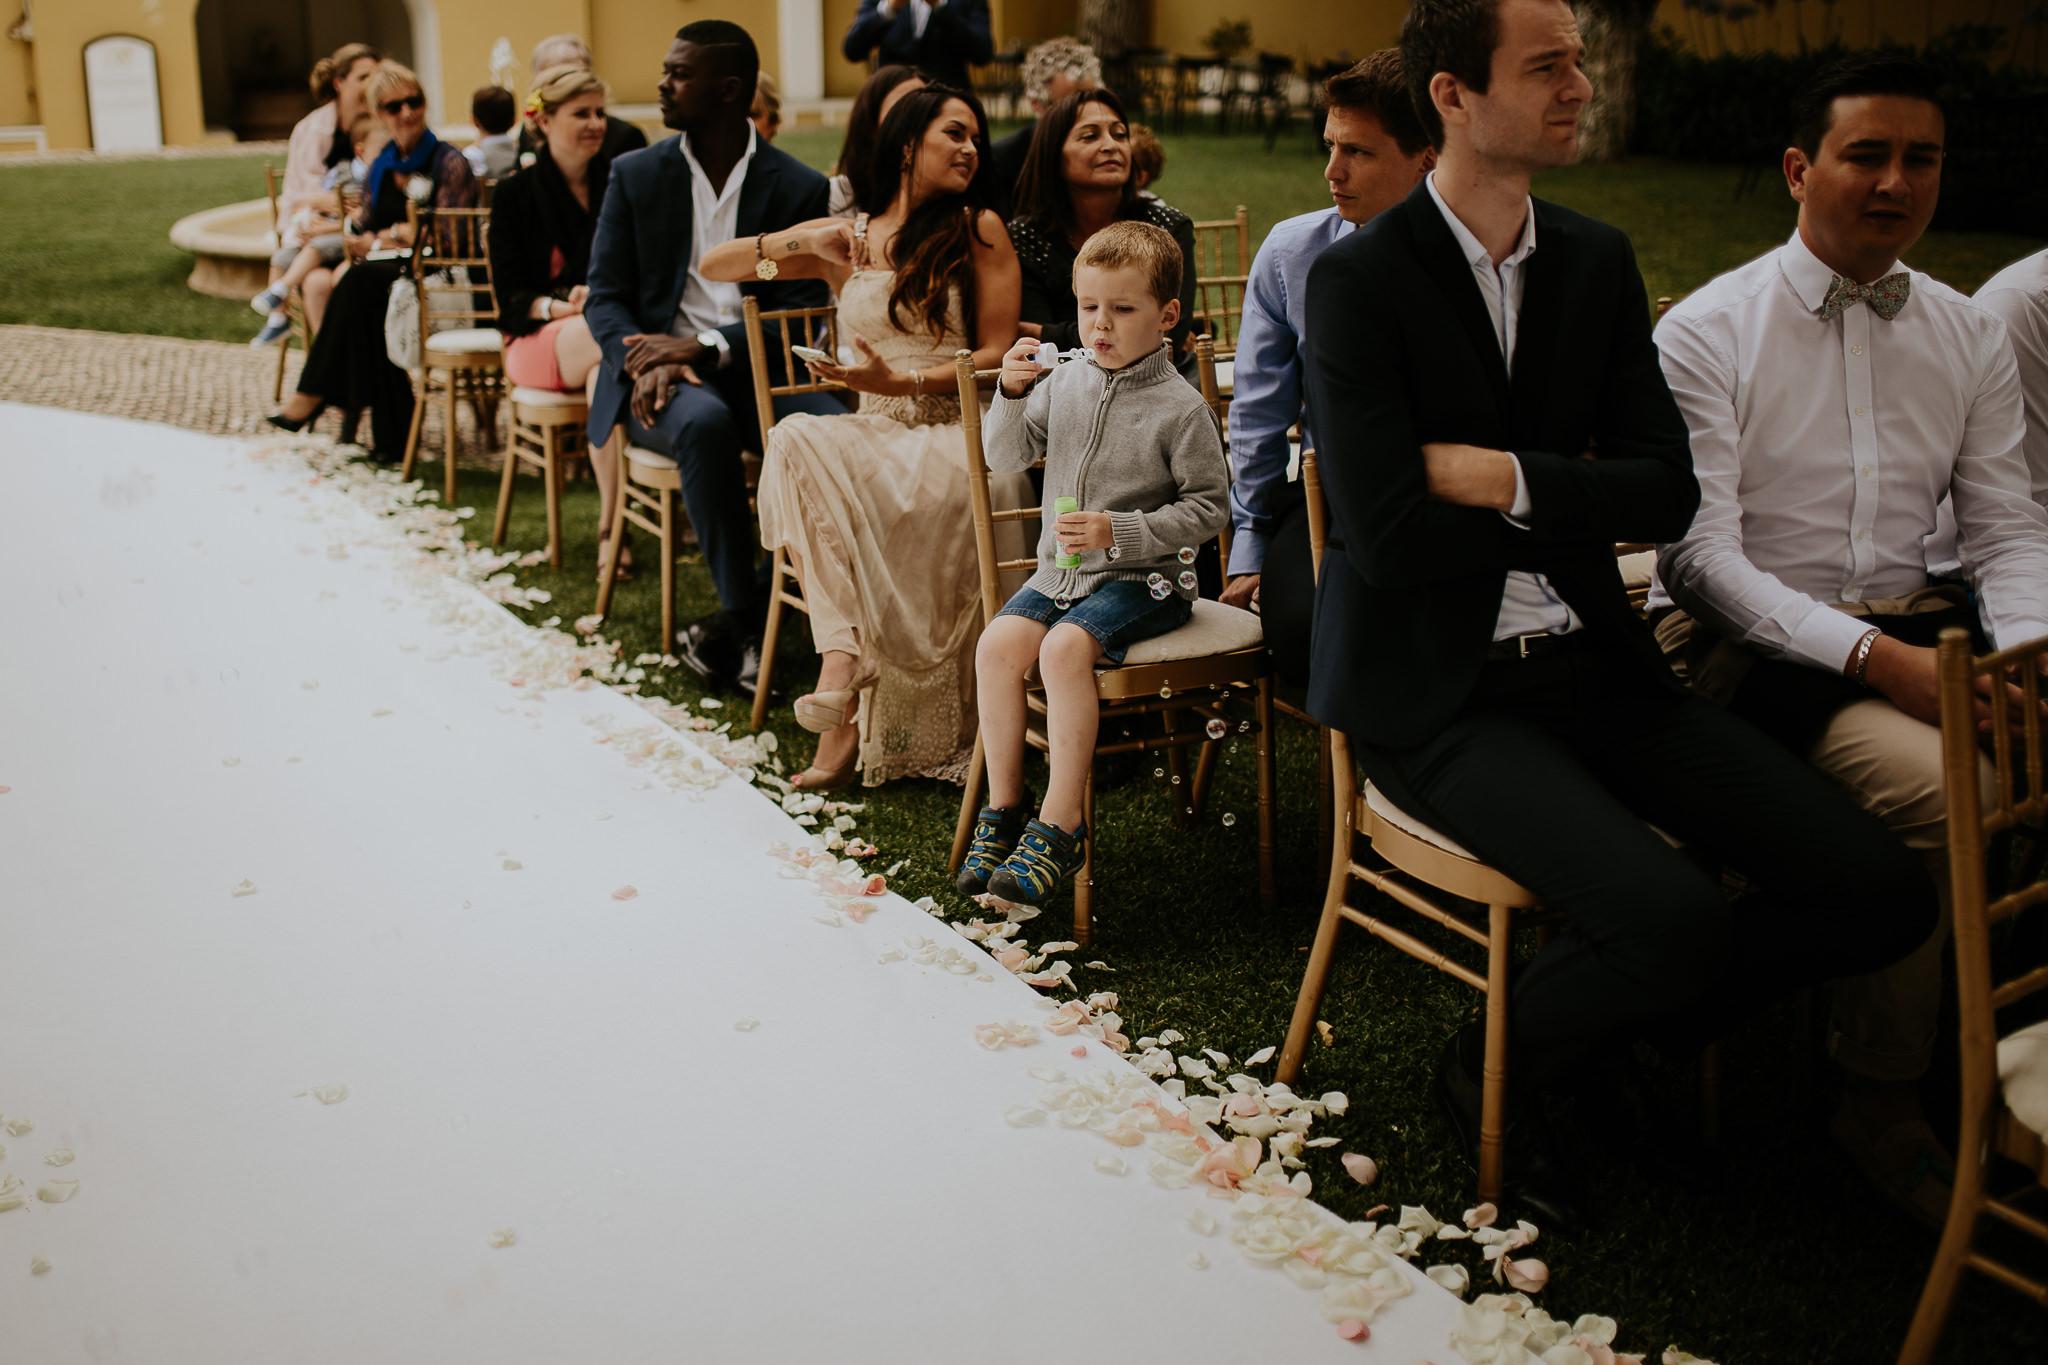 romina_thomas_destination_wedding_photography_fotografia_de_casamento_lisbon_sintra_penha_longa_resort-59